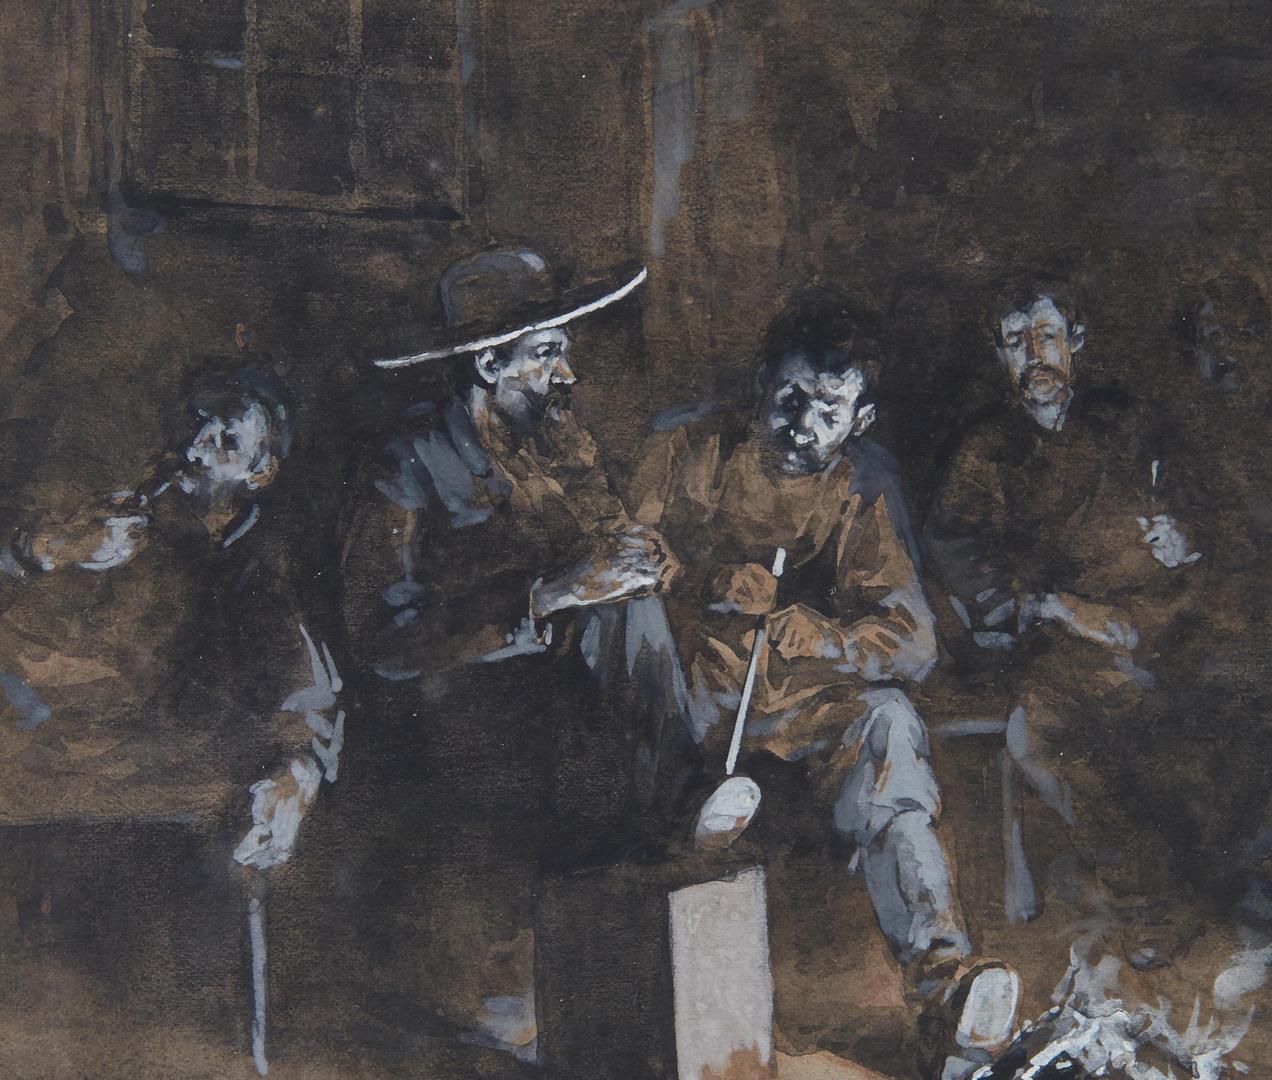 Lot 613: Attr. Allen C. Redwood, Tavern Scene Illustration